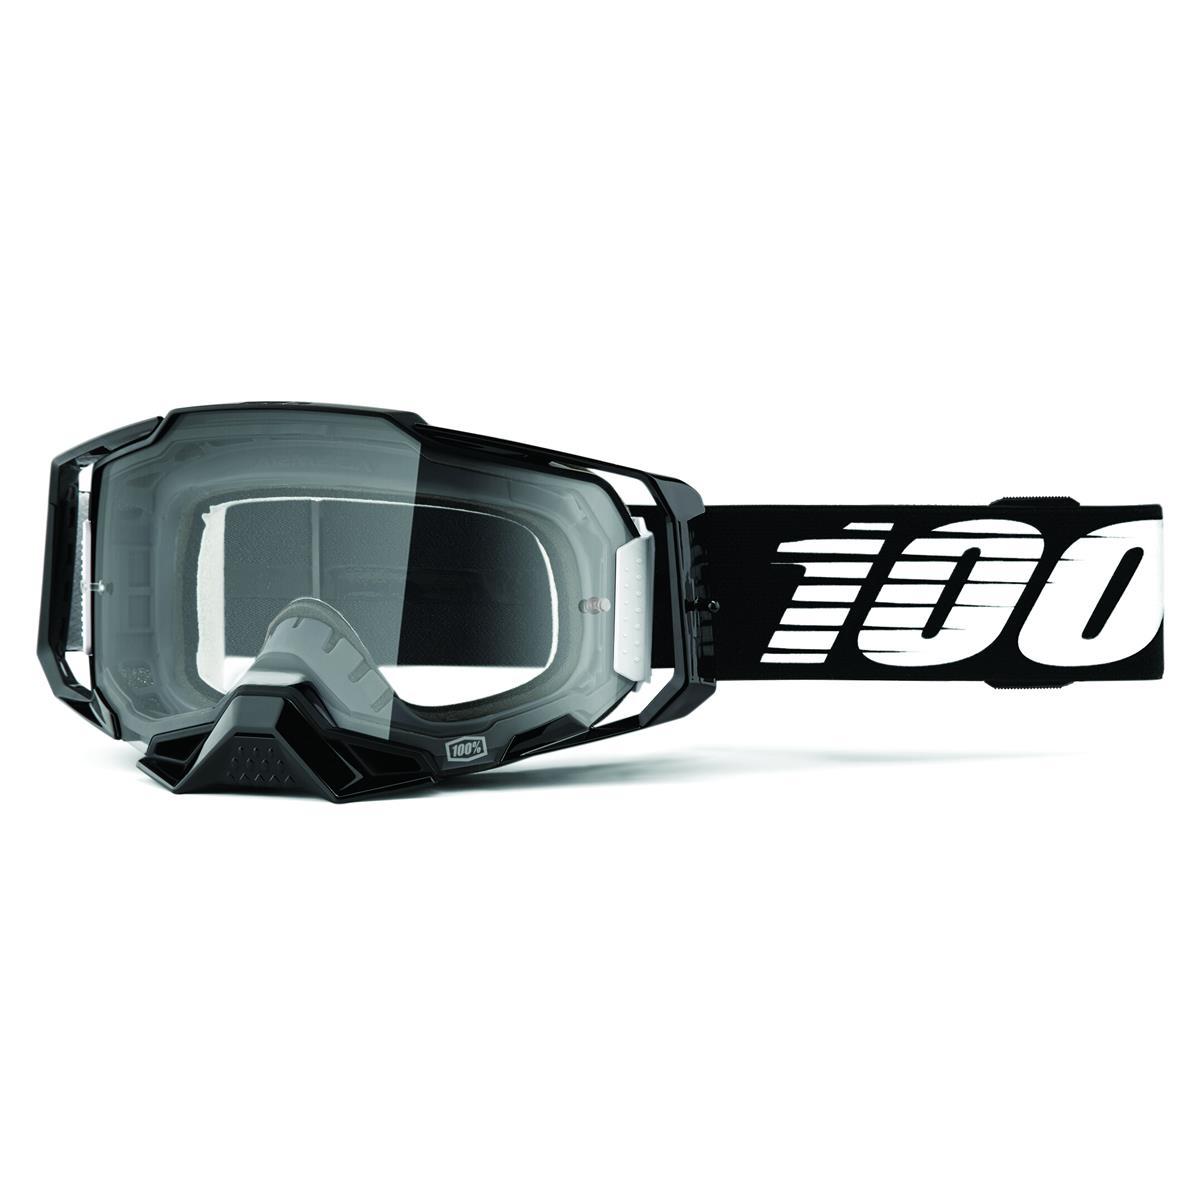 100% Crossbrille Armega Schwarz - Klar, Anti Fog